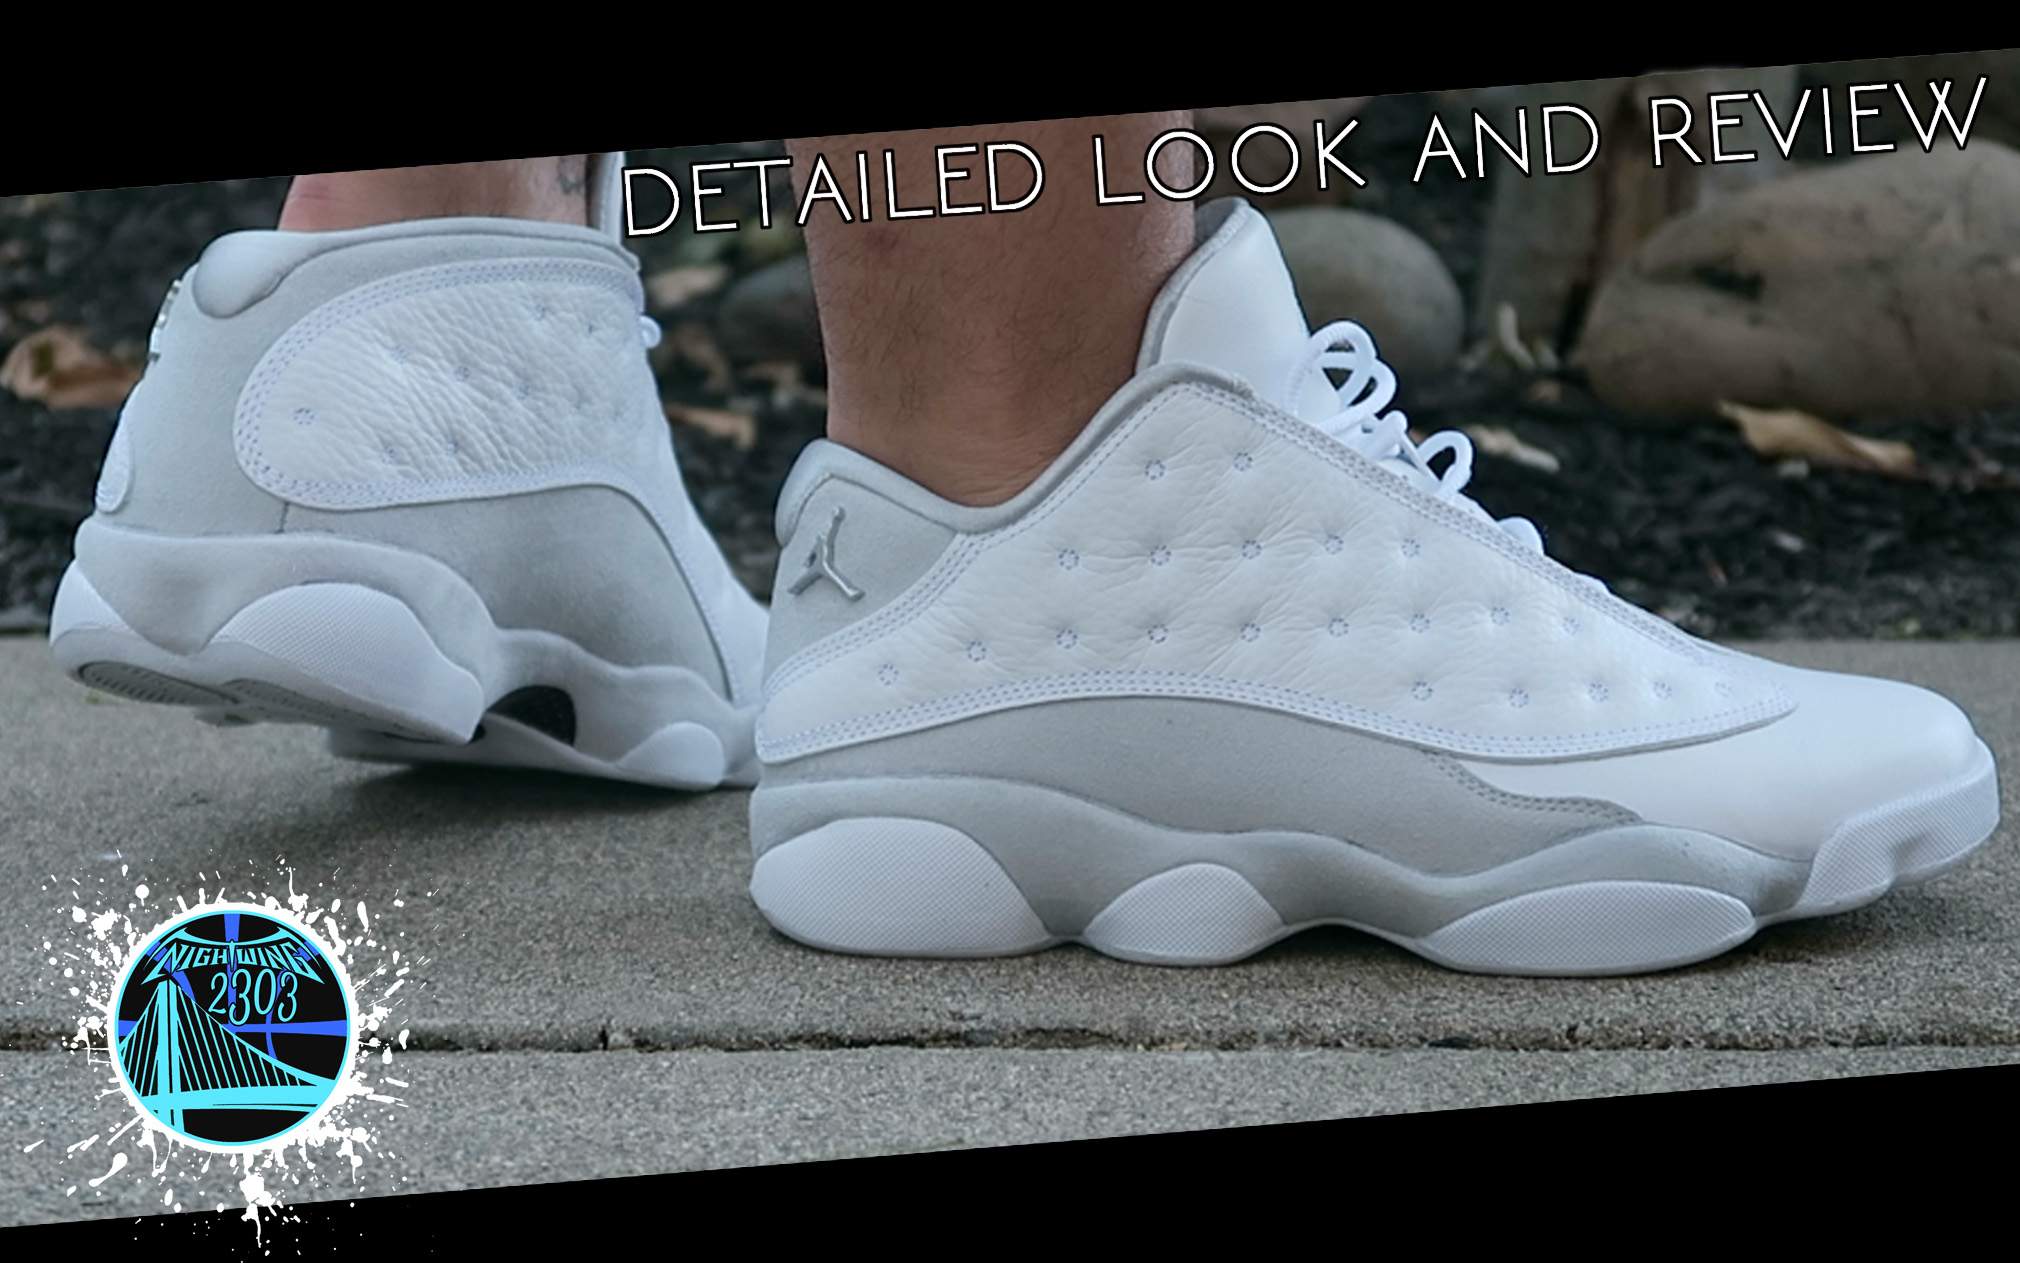 Air Jordan 13 Retro Low 'Pure Money' | Detailed Look and Review